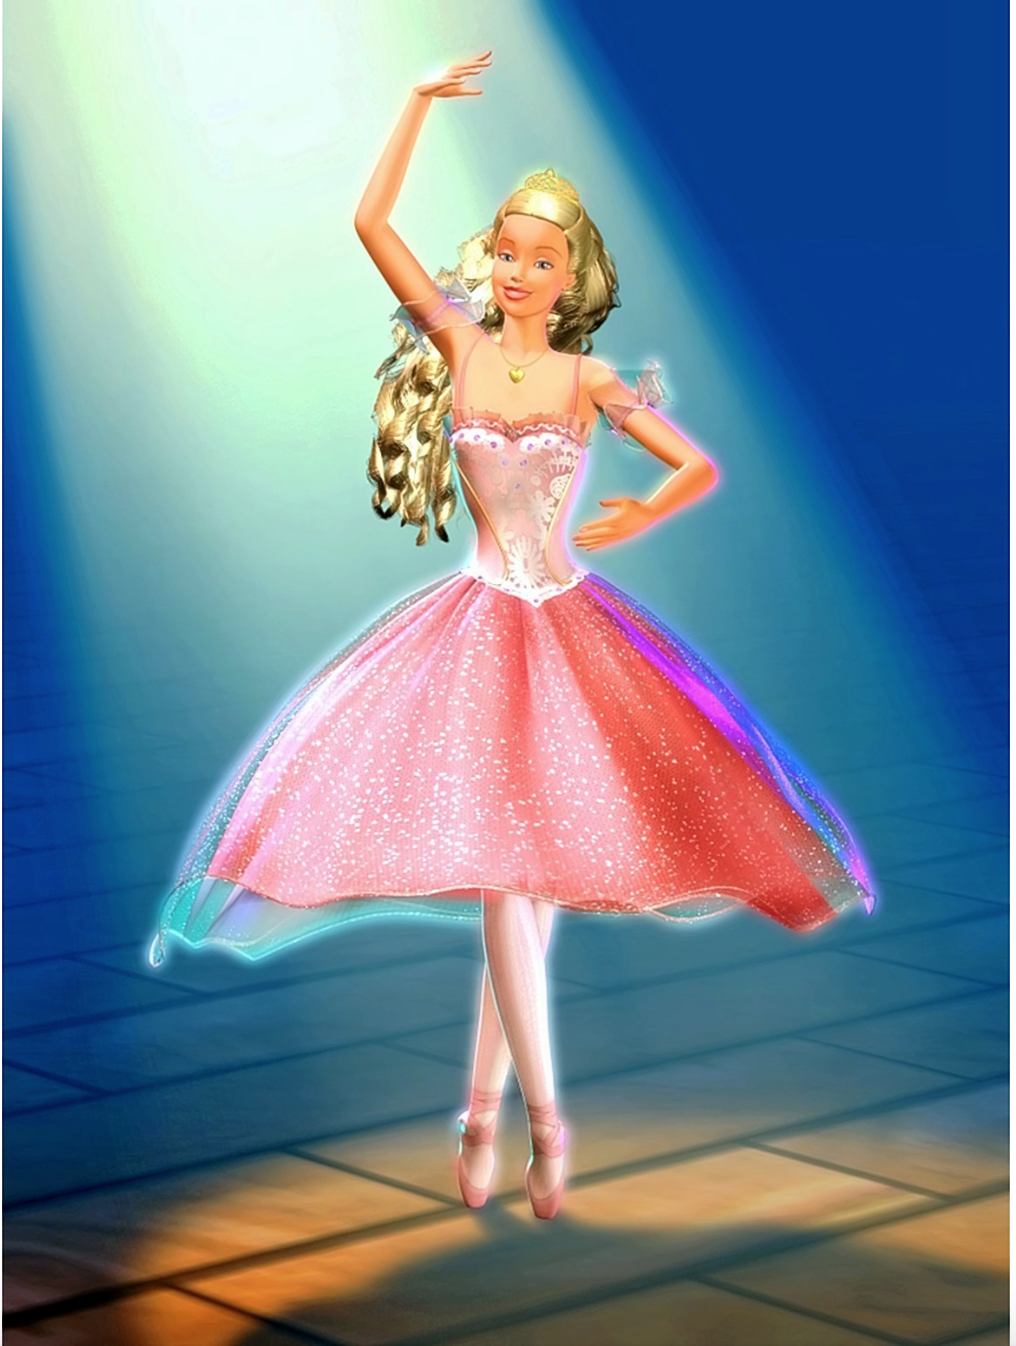 Barbie nutcracker movie images of the nutcracker clipart jpg black and white Clara as the Sugar Plum Princess from Barbie in the Nutcracker ... jpg black and white